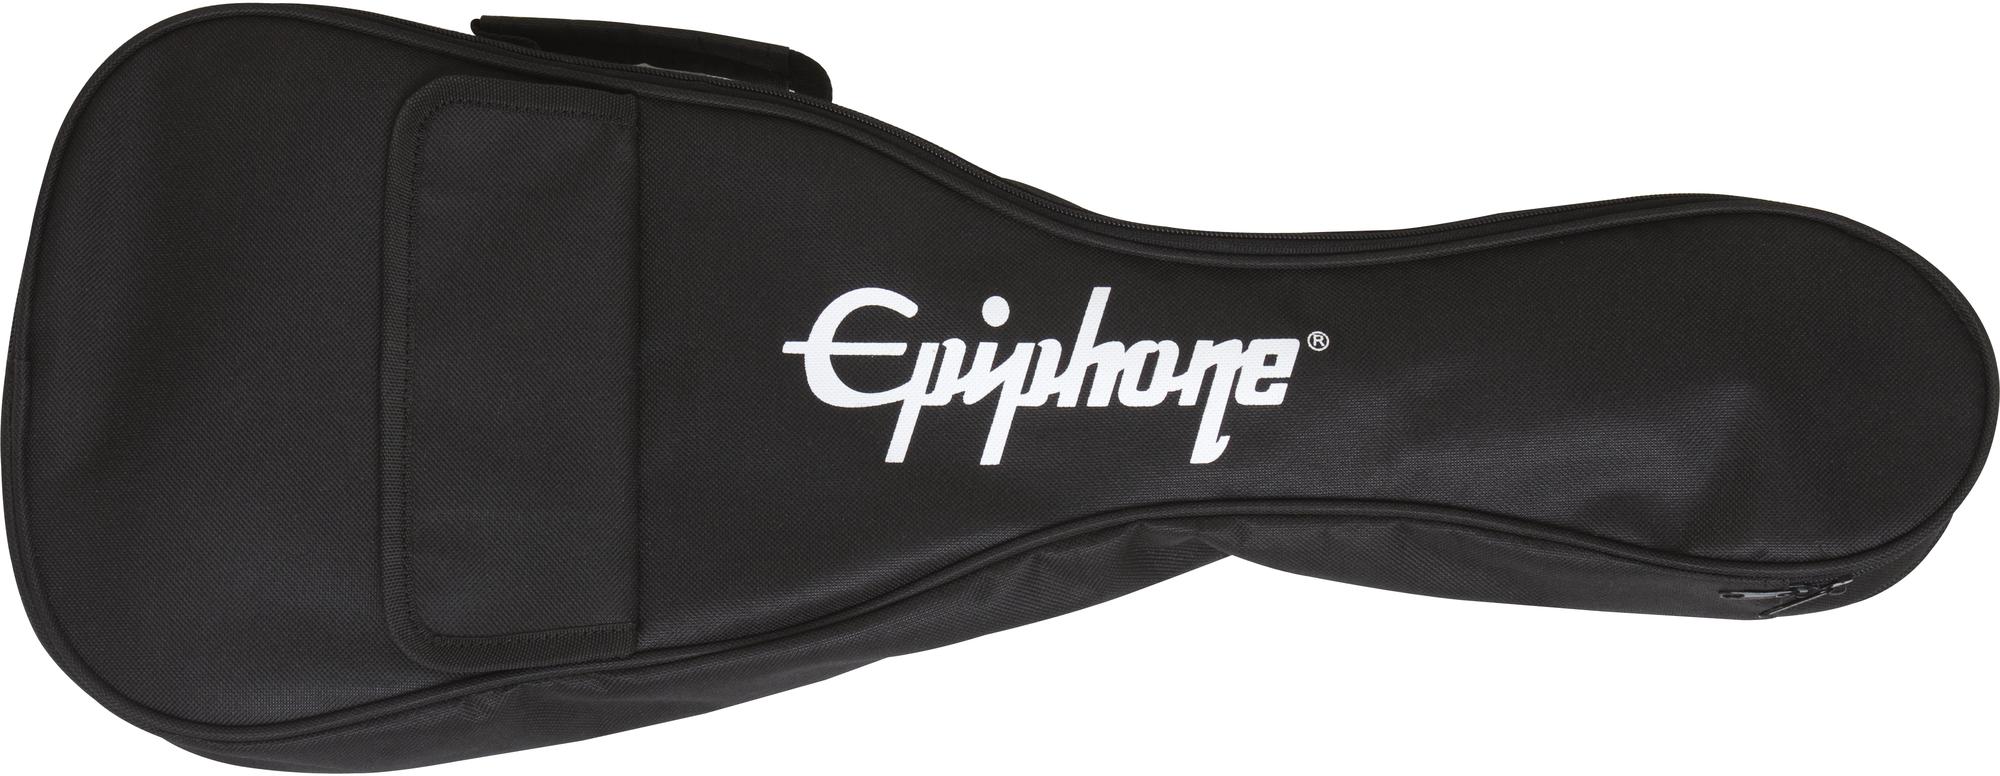 Epiphone Les Paul Uke Concert Heritage Cherry SB